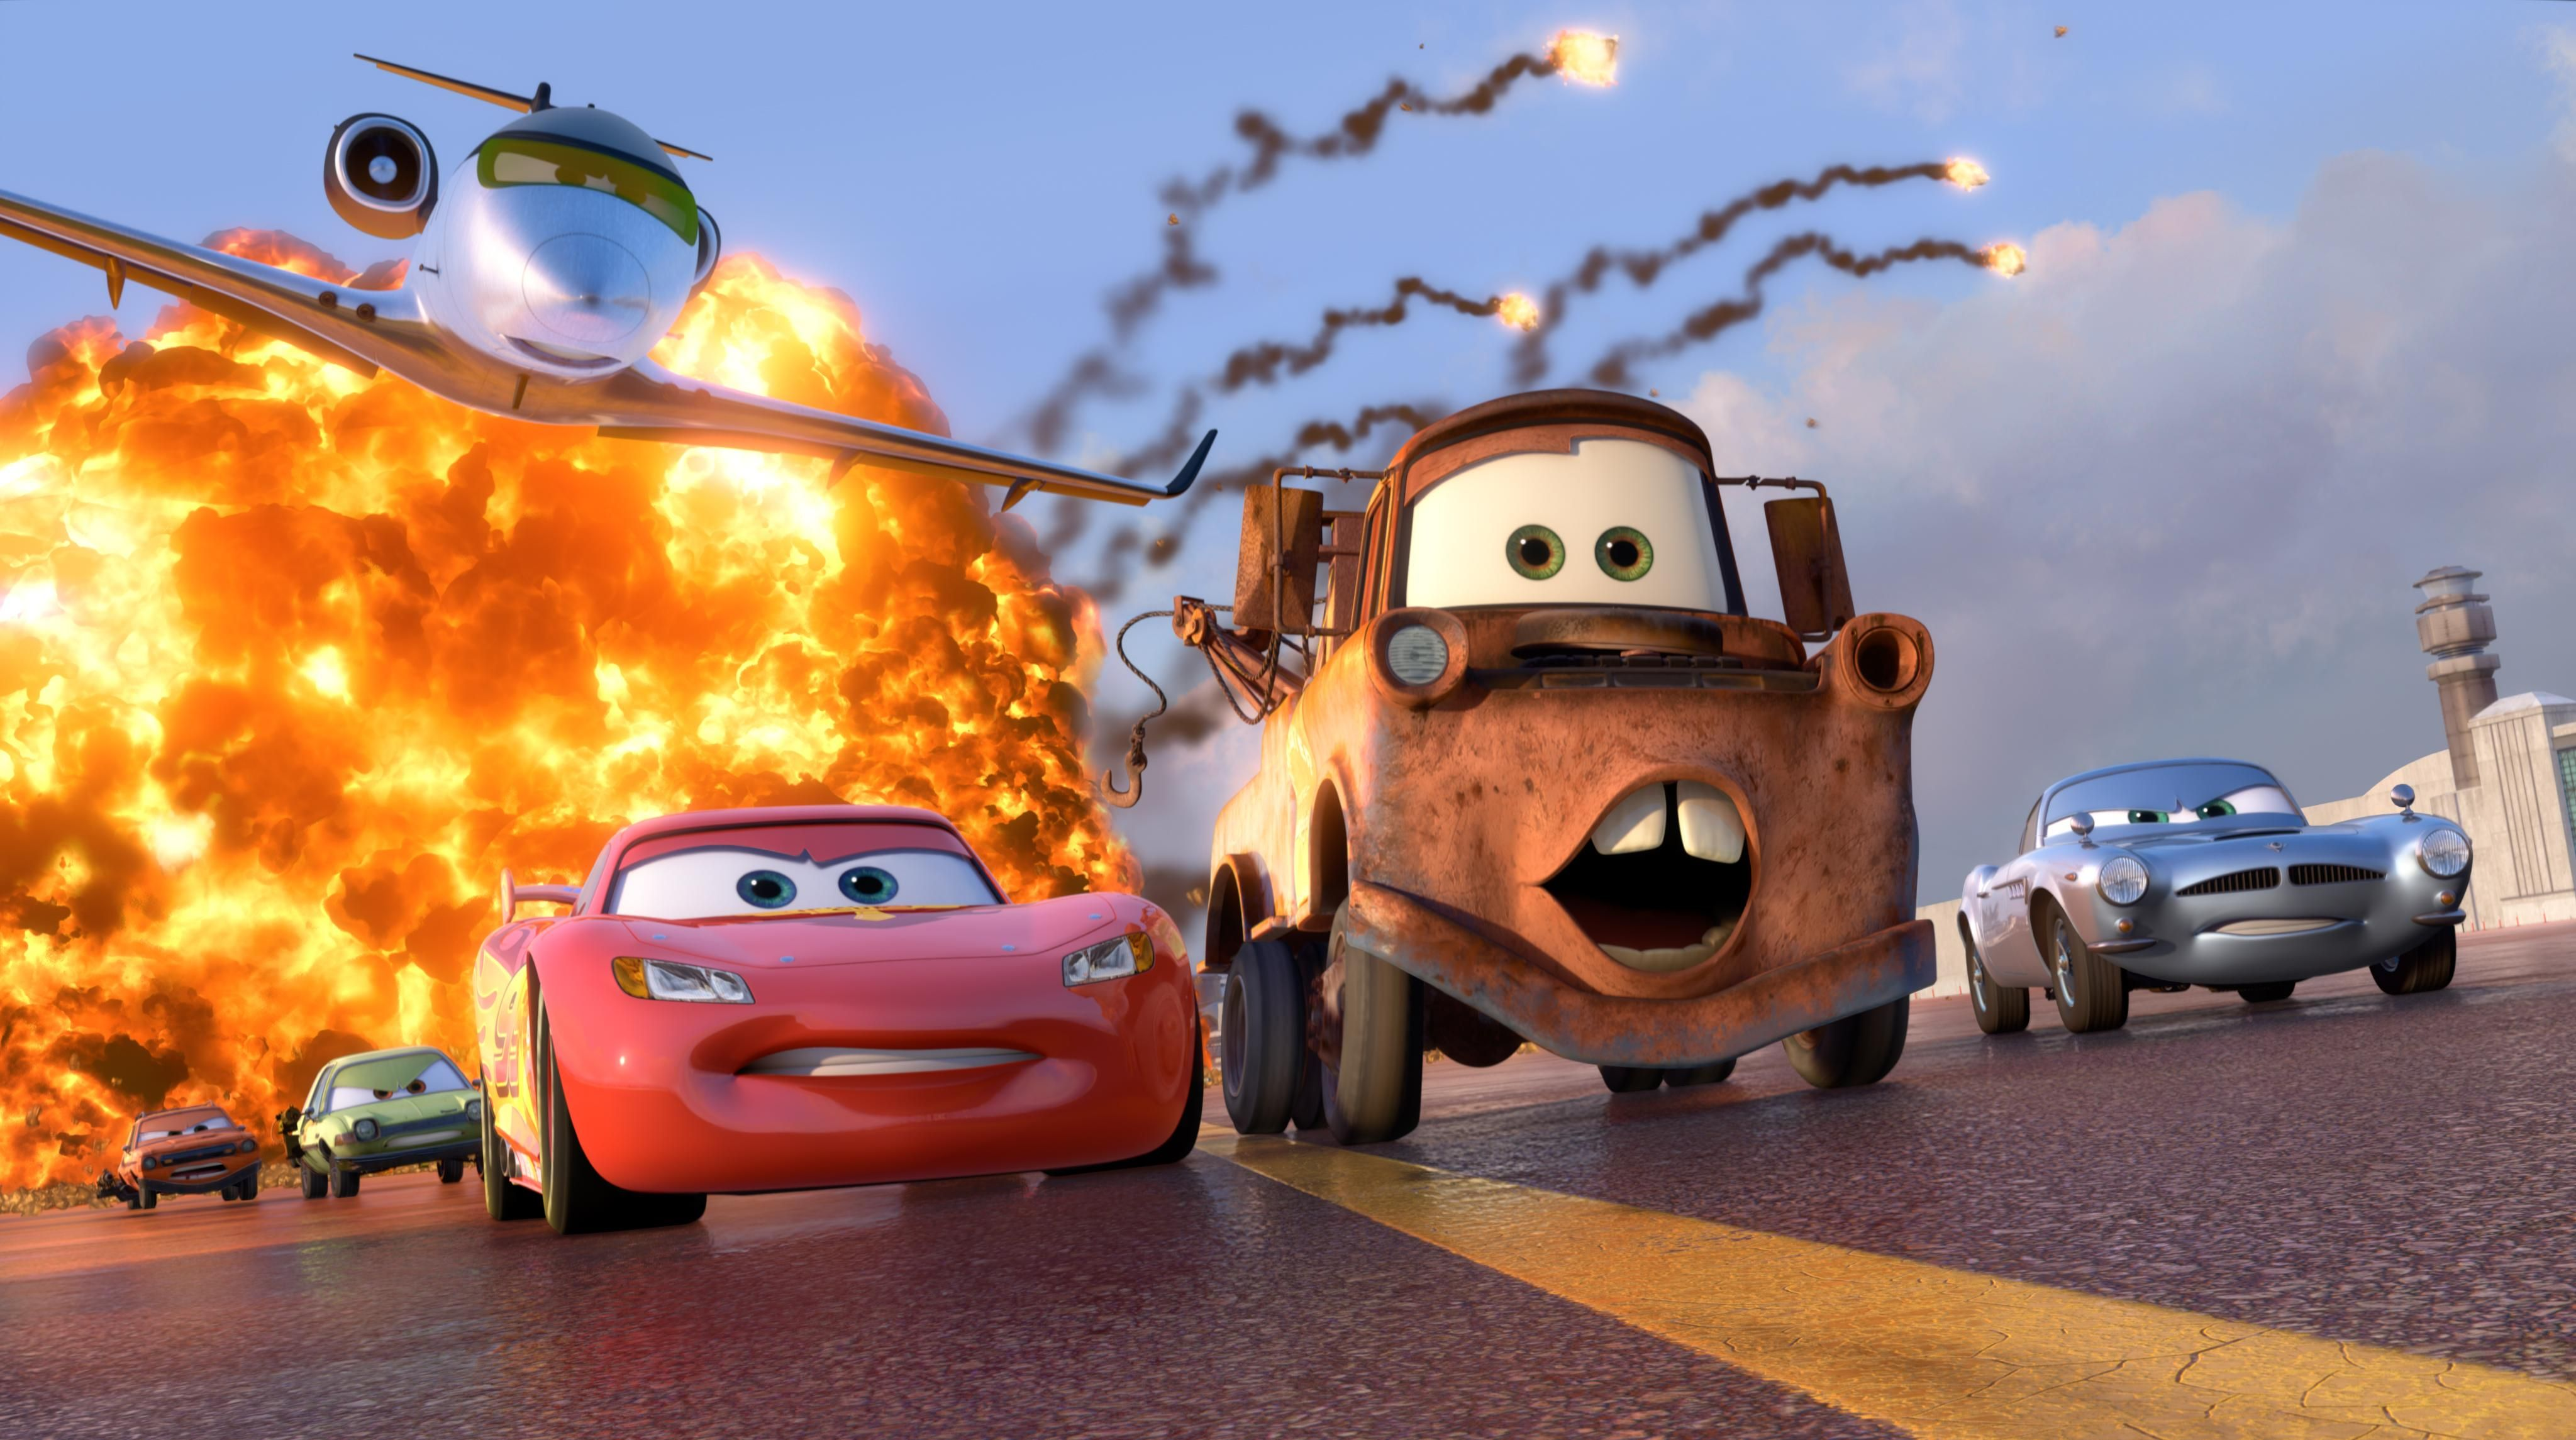 Pin By Jack Smith Atesting On Testing Disney Cars Pixar Cars Cars Movie [ 2290 x 4096 Pixel ]